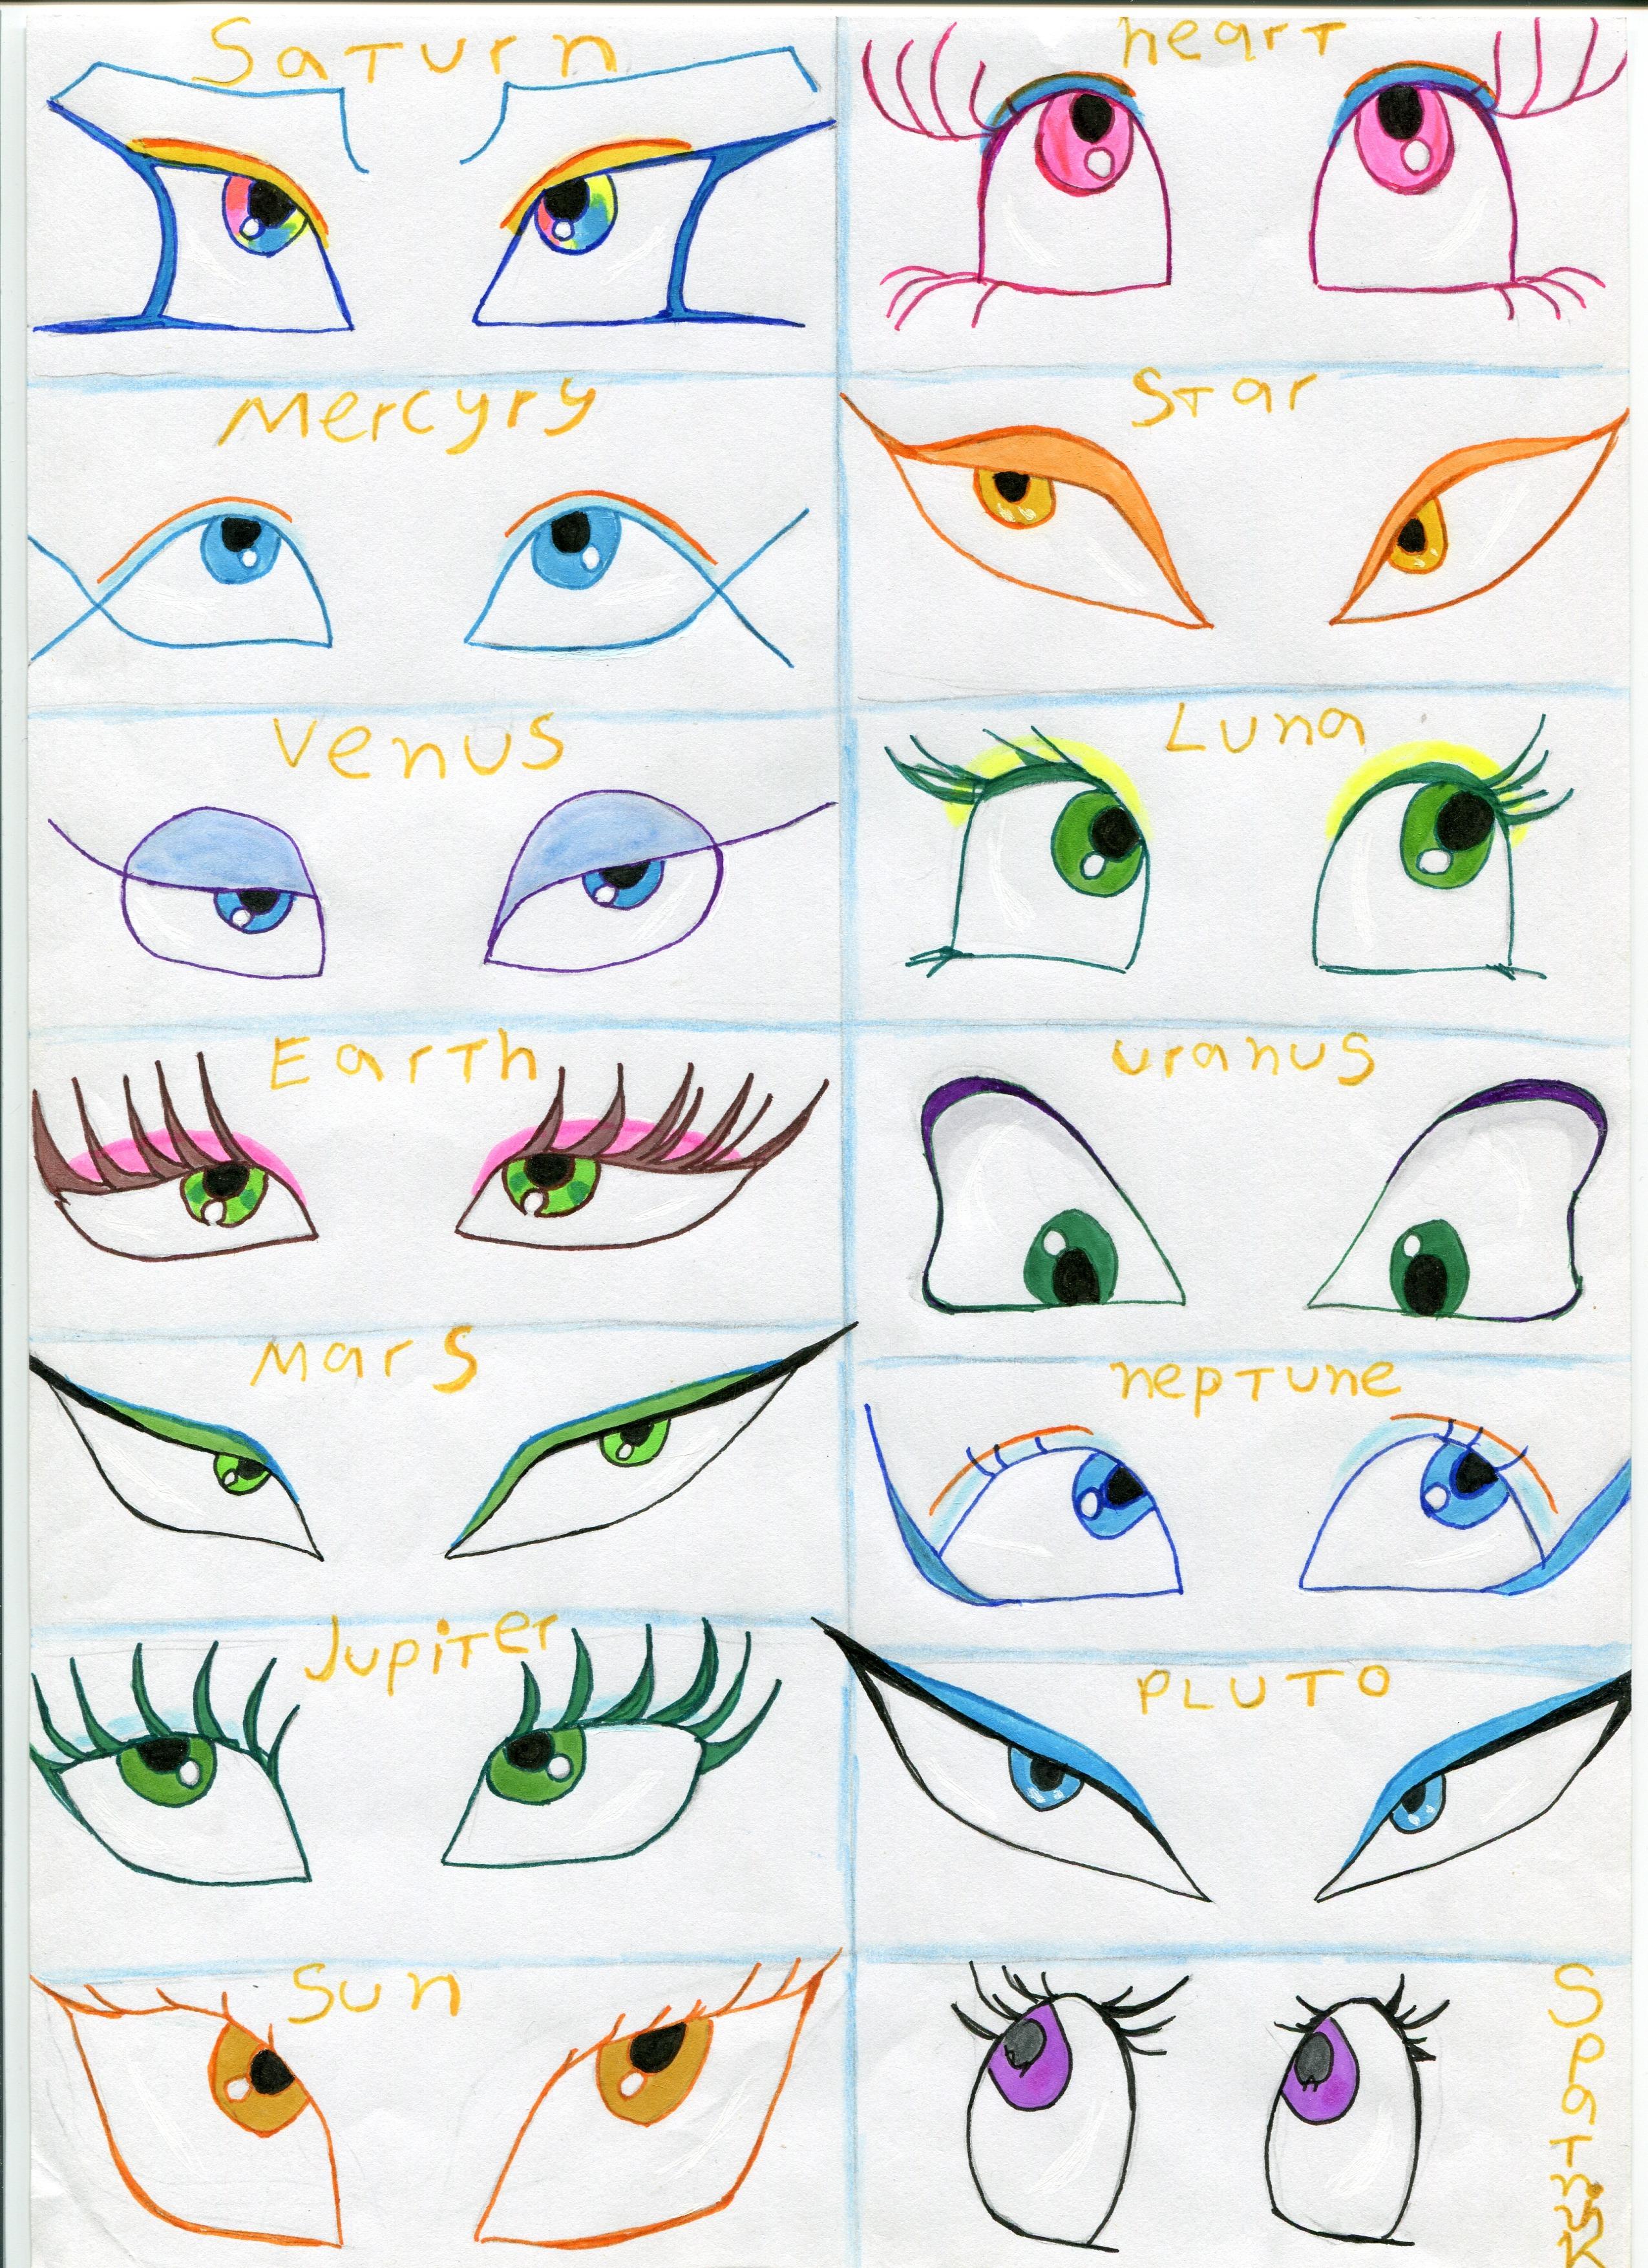 Gambar Melihat Melihat Garis Fon Hidung Mata Animasi